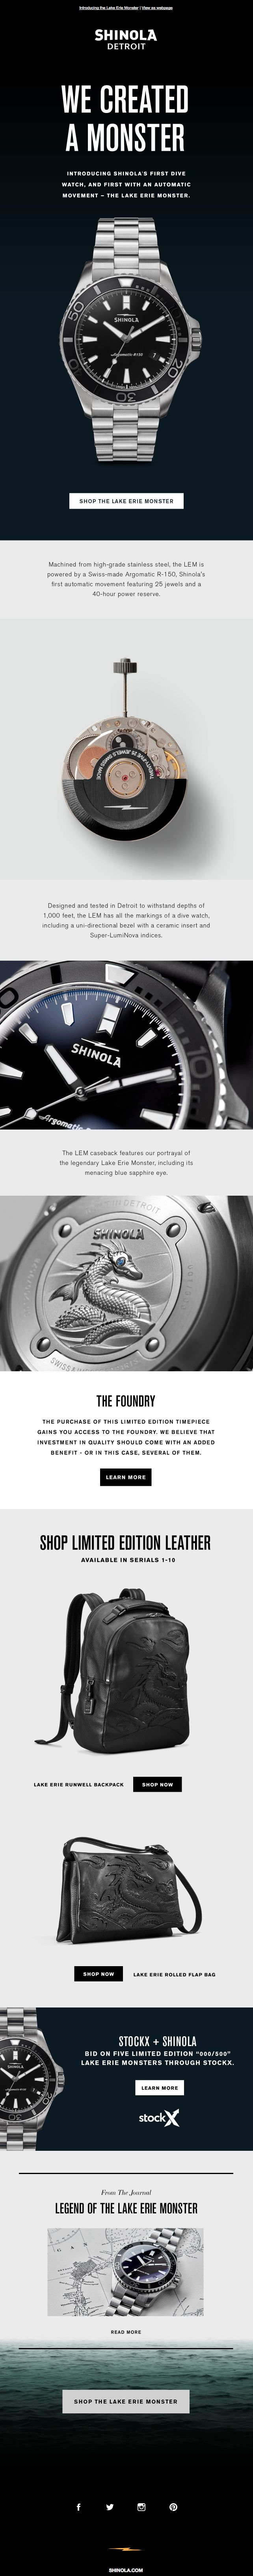 Beautiful email design from Shinola